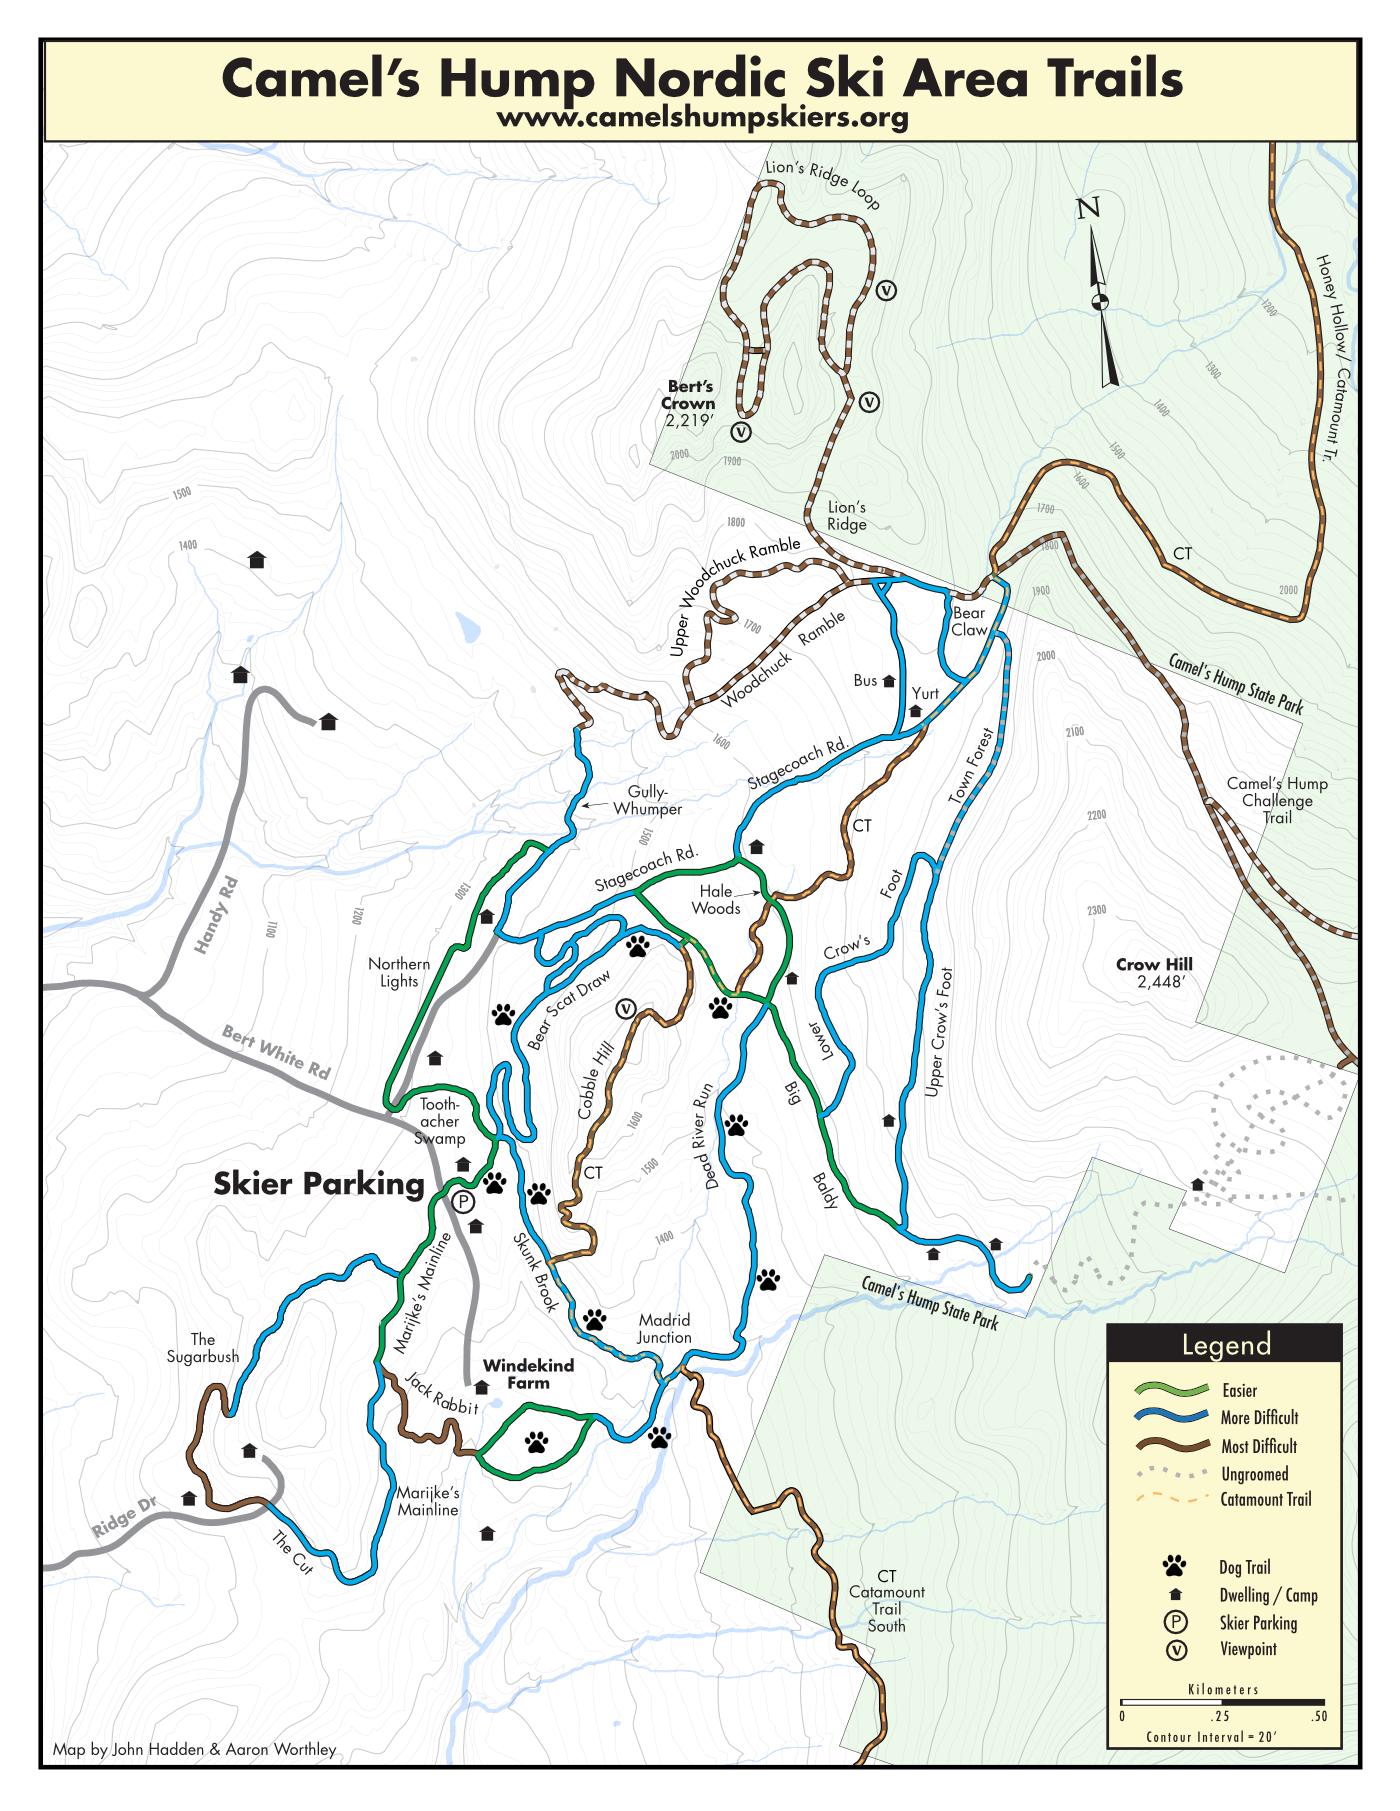 CHNSA-map-20-21